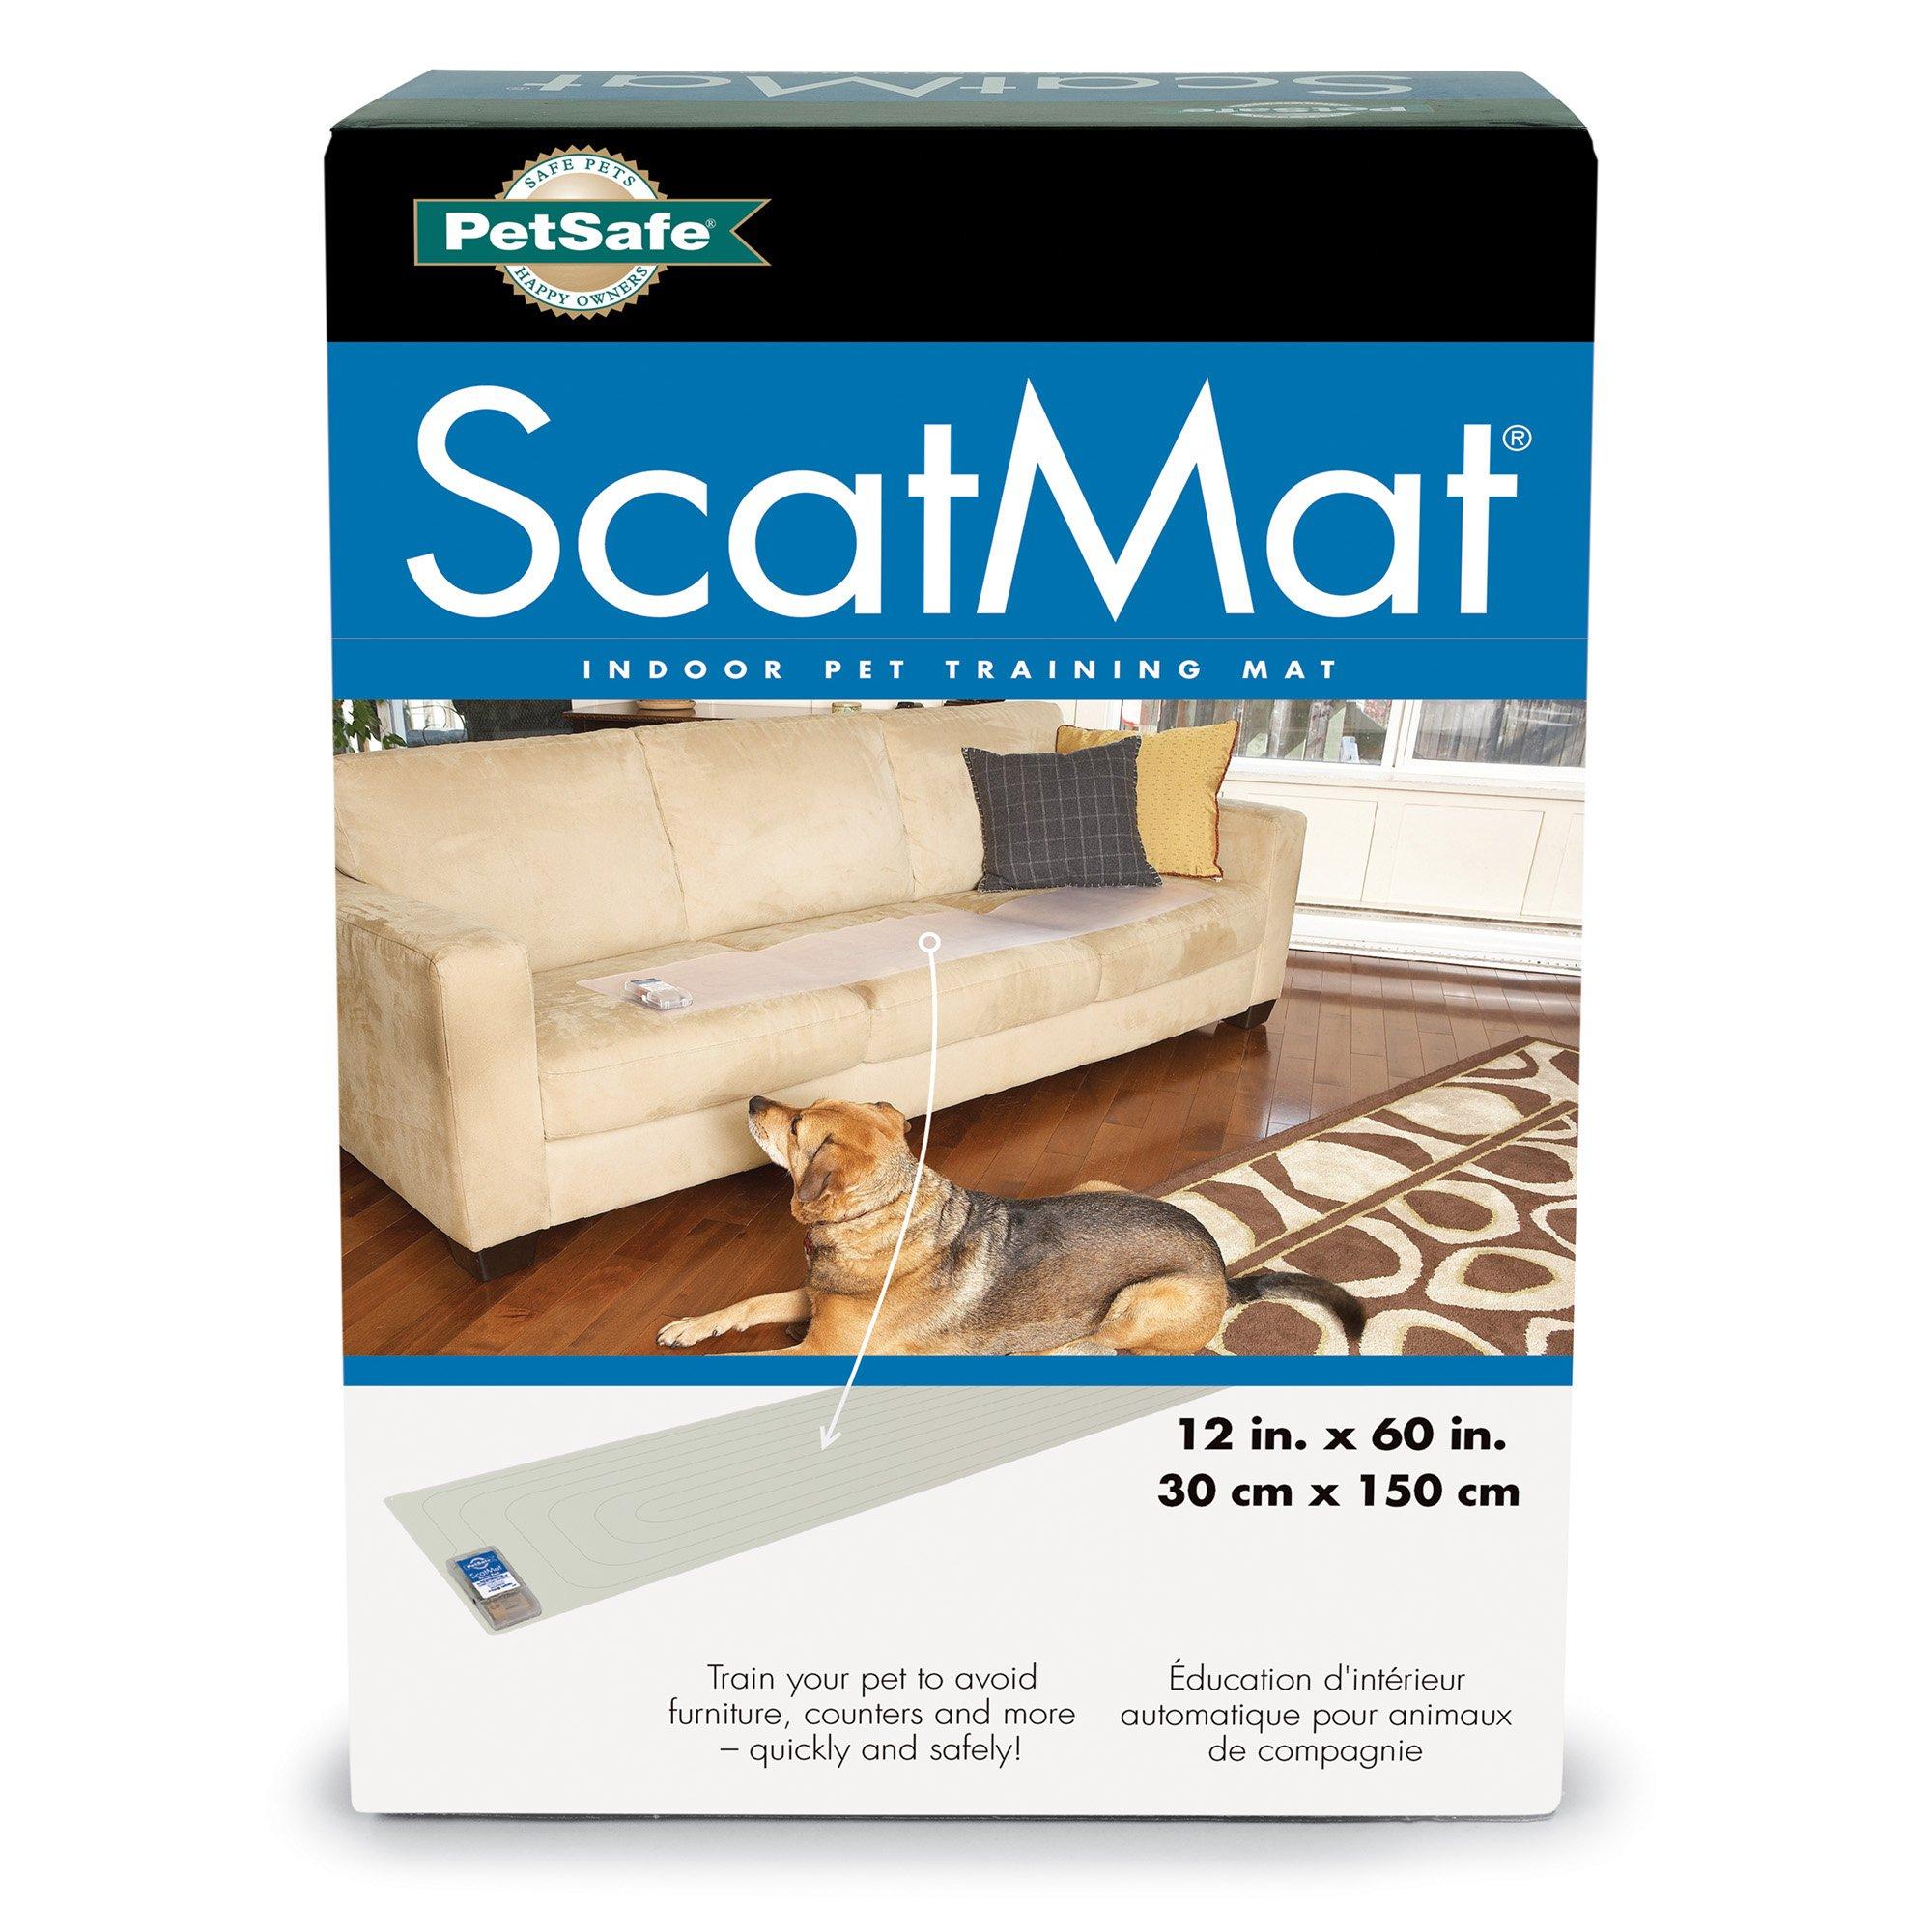 PetSafe ScatMat Pet Training Mat, Sofa 60 x 12 inches